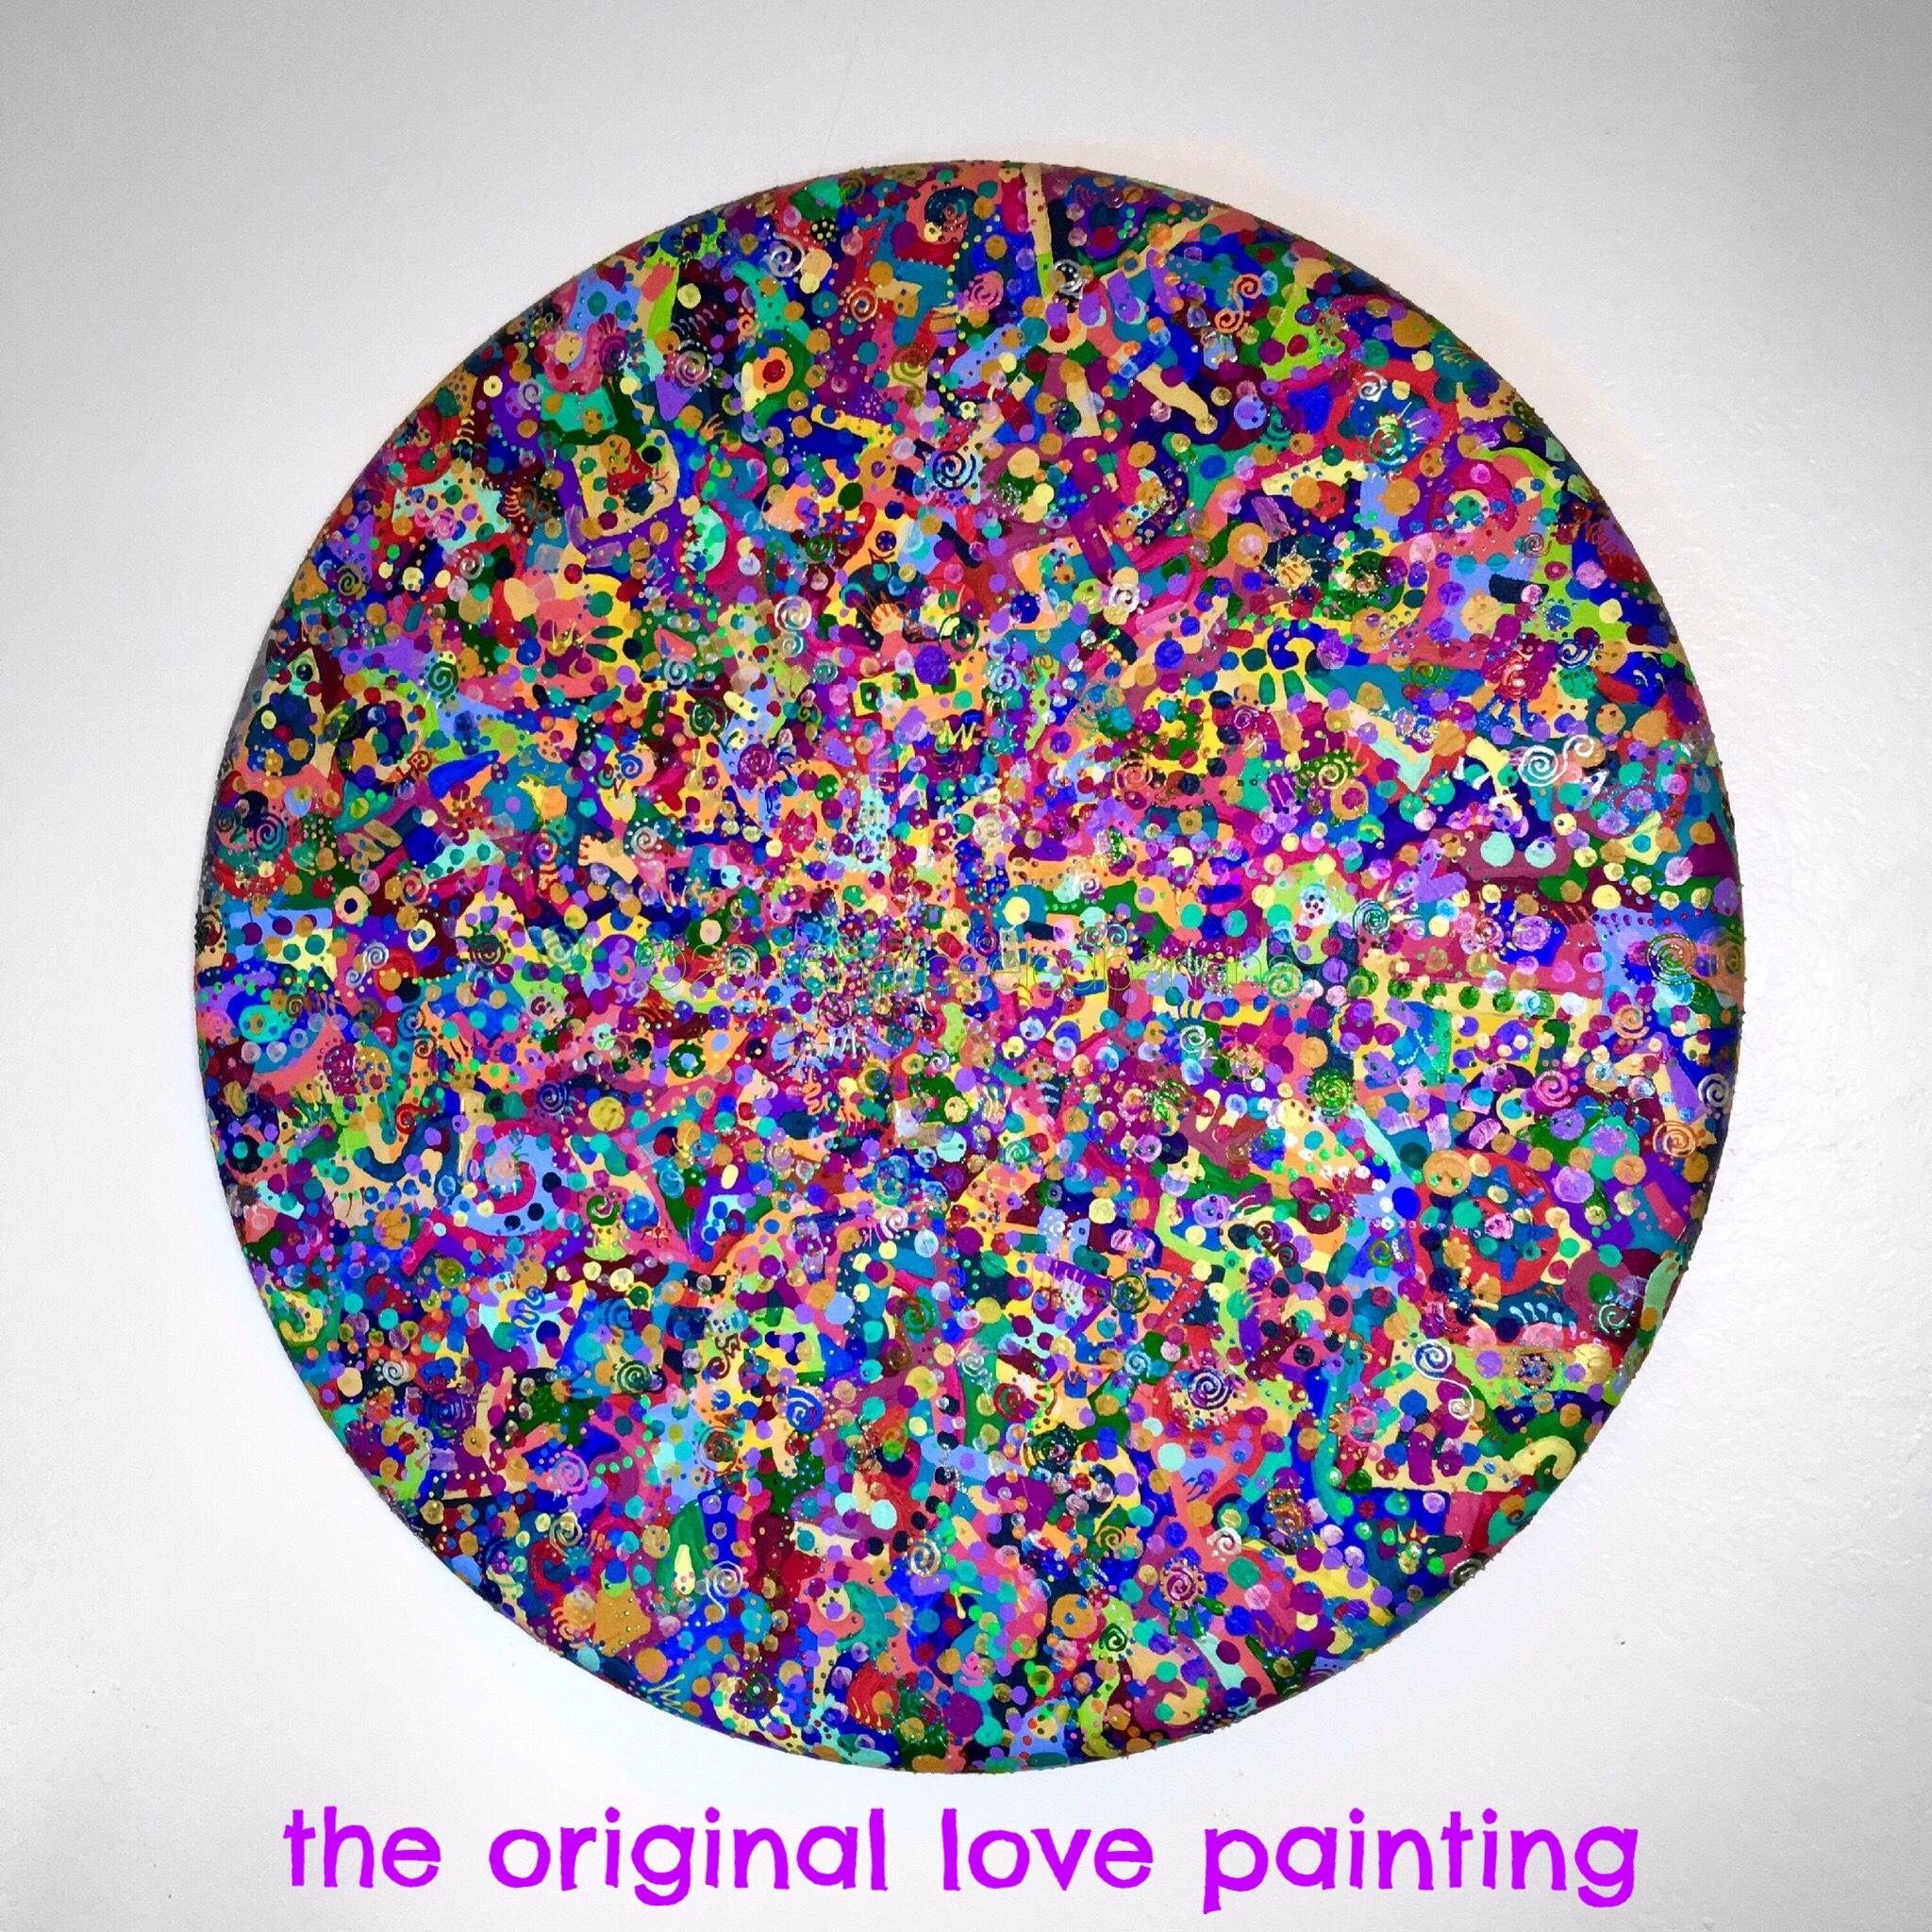 the original love painting - love no. 01